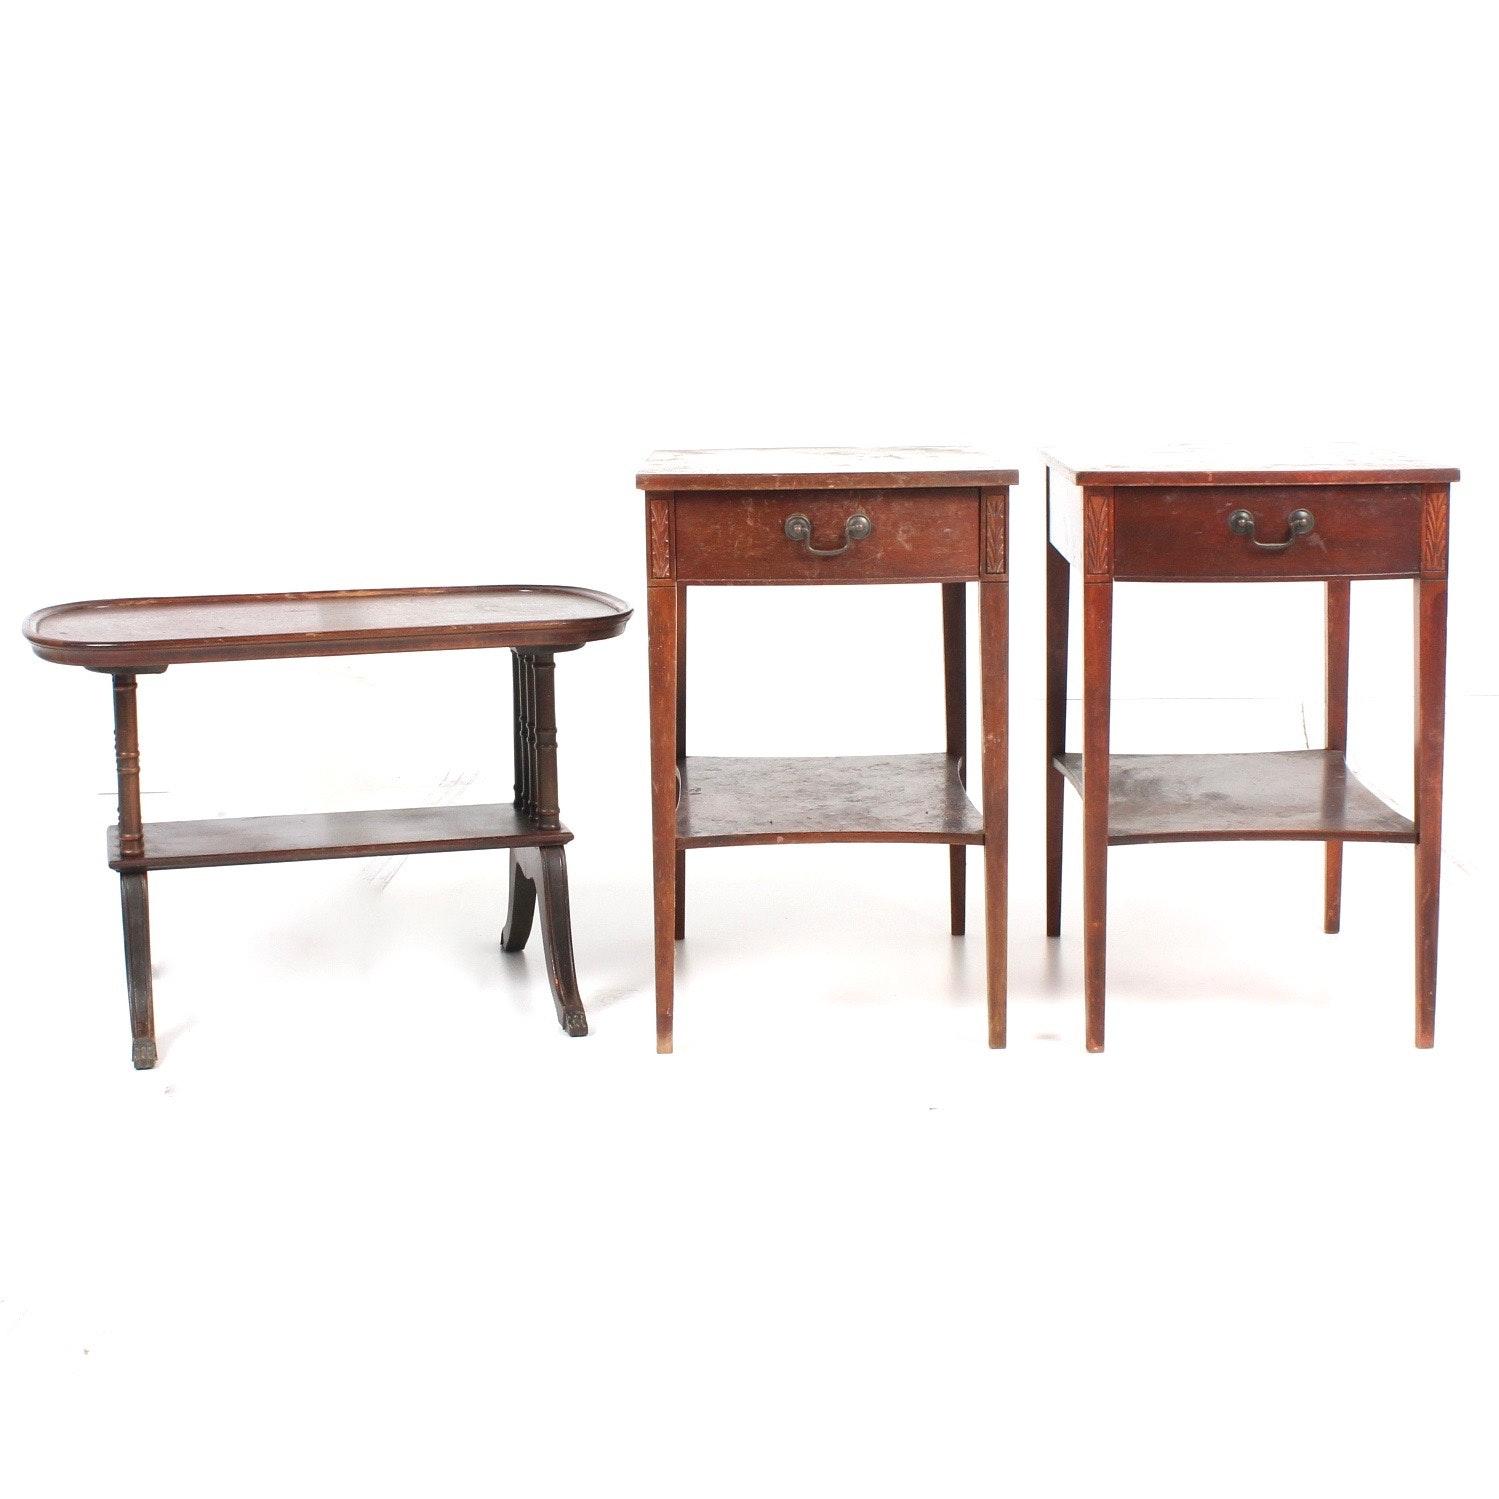 Three Vintage Mahogany Tables Featuring Mersman